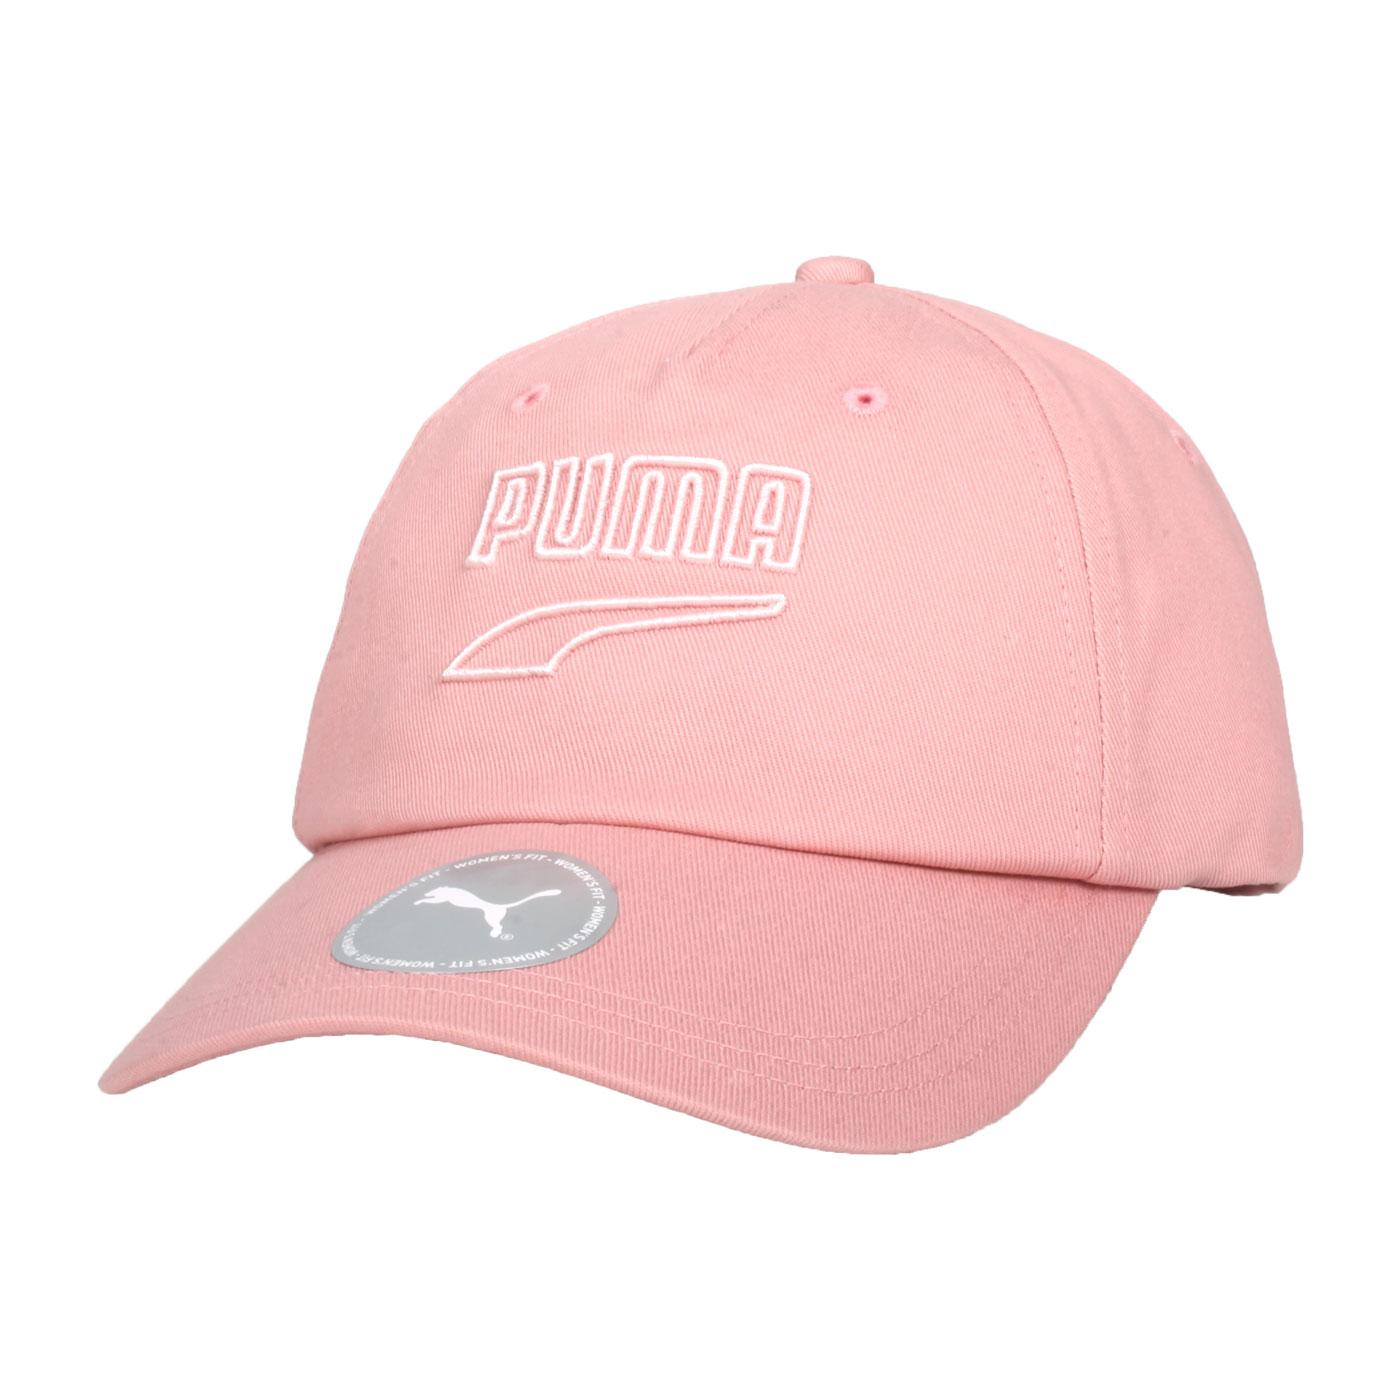 PUMA 棒球帽 02284502